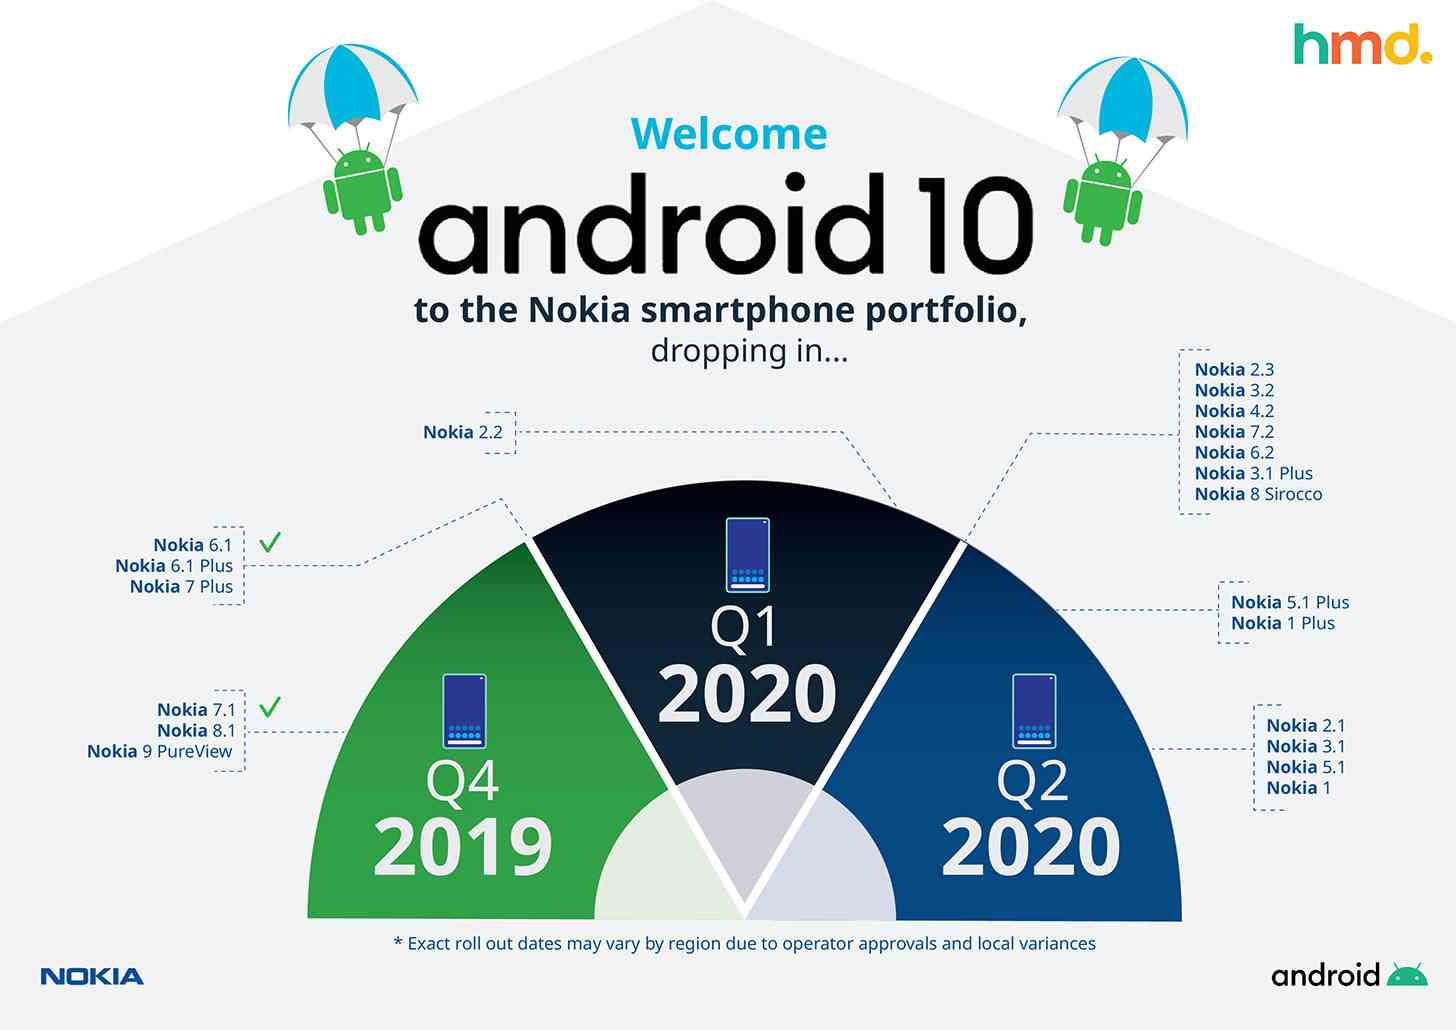 Nokia Android 10 update schedule